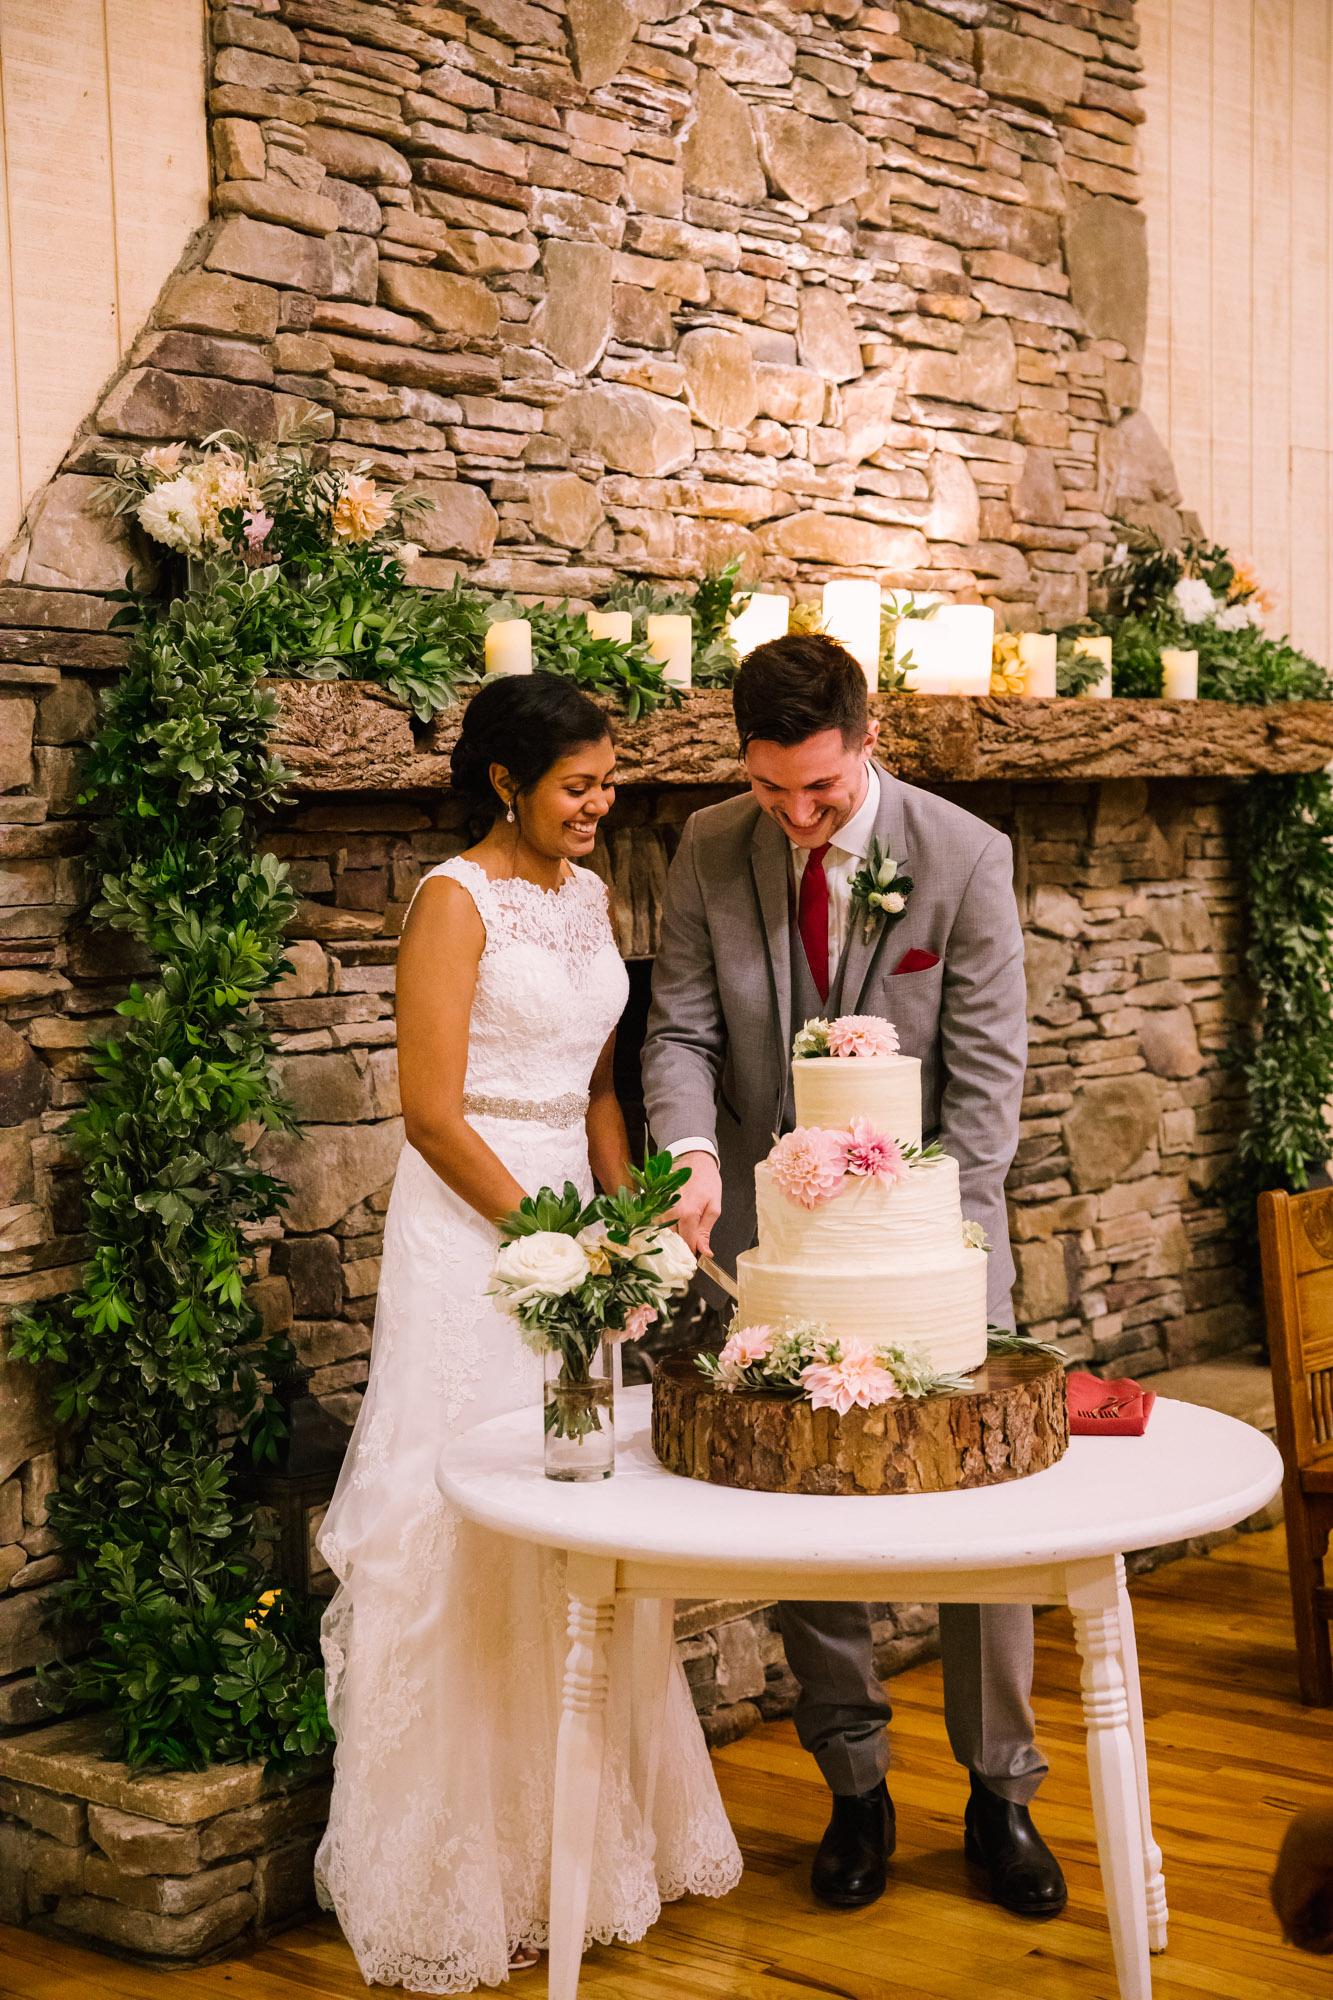 Waynesville NC Wedding Photography | Bride and Groom Cut Cake Full Body